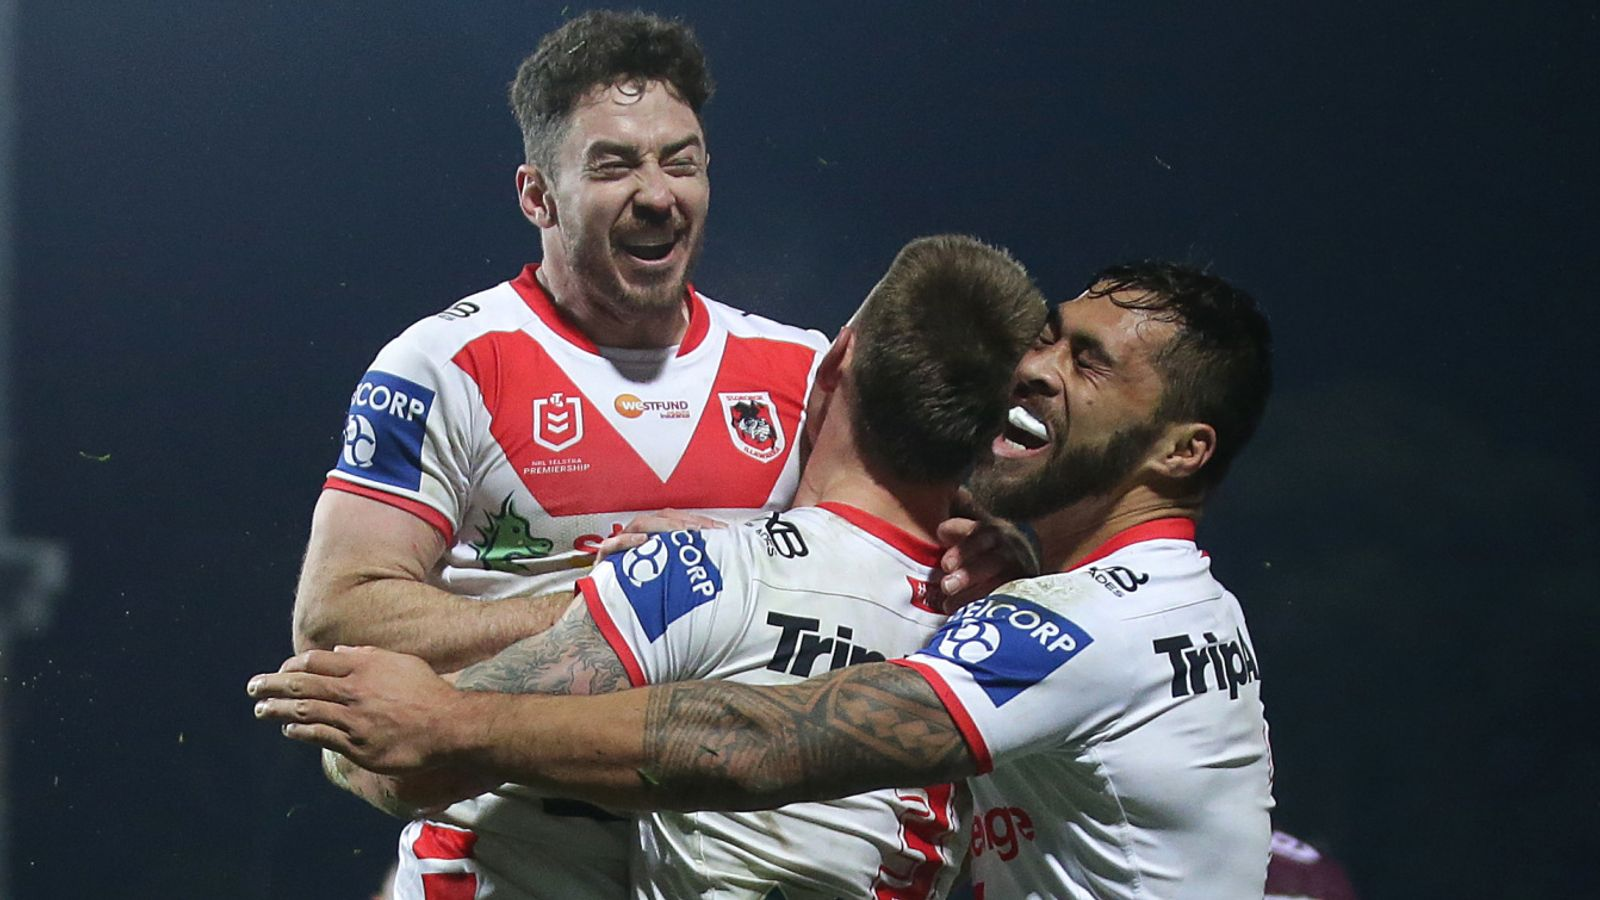 Sunday's NRL: Parramatta Eels slip past Newcastle Knights; Delight for St George Illawarra Dragons